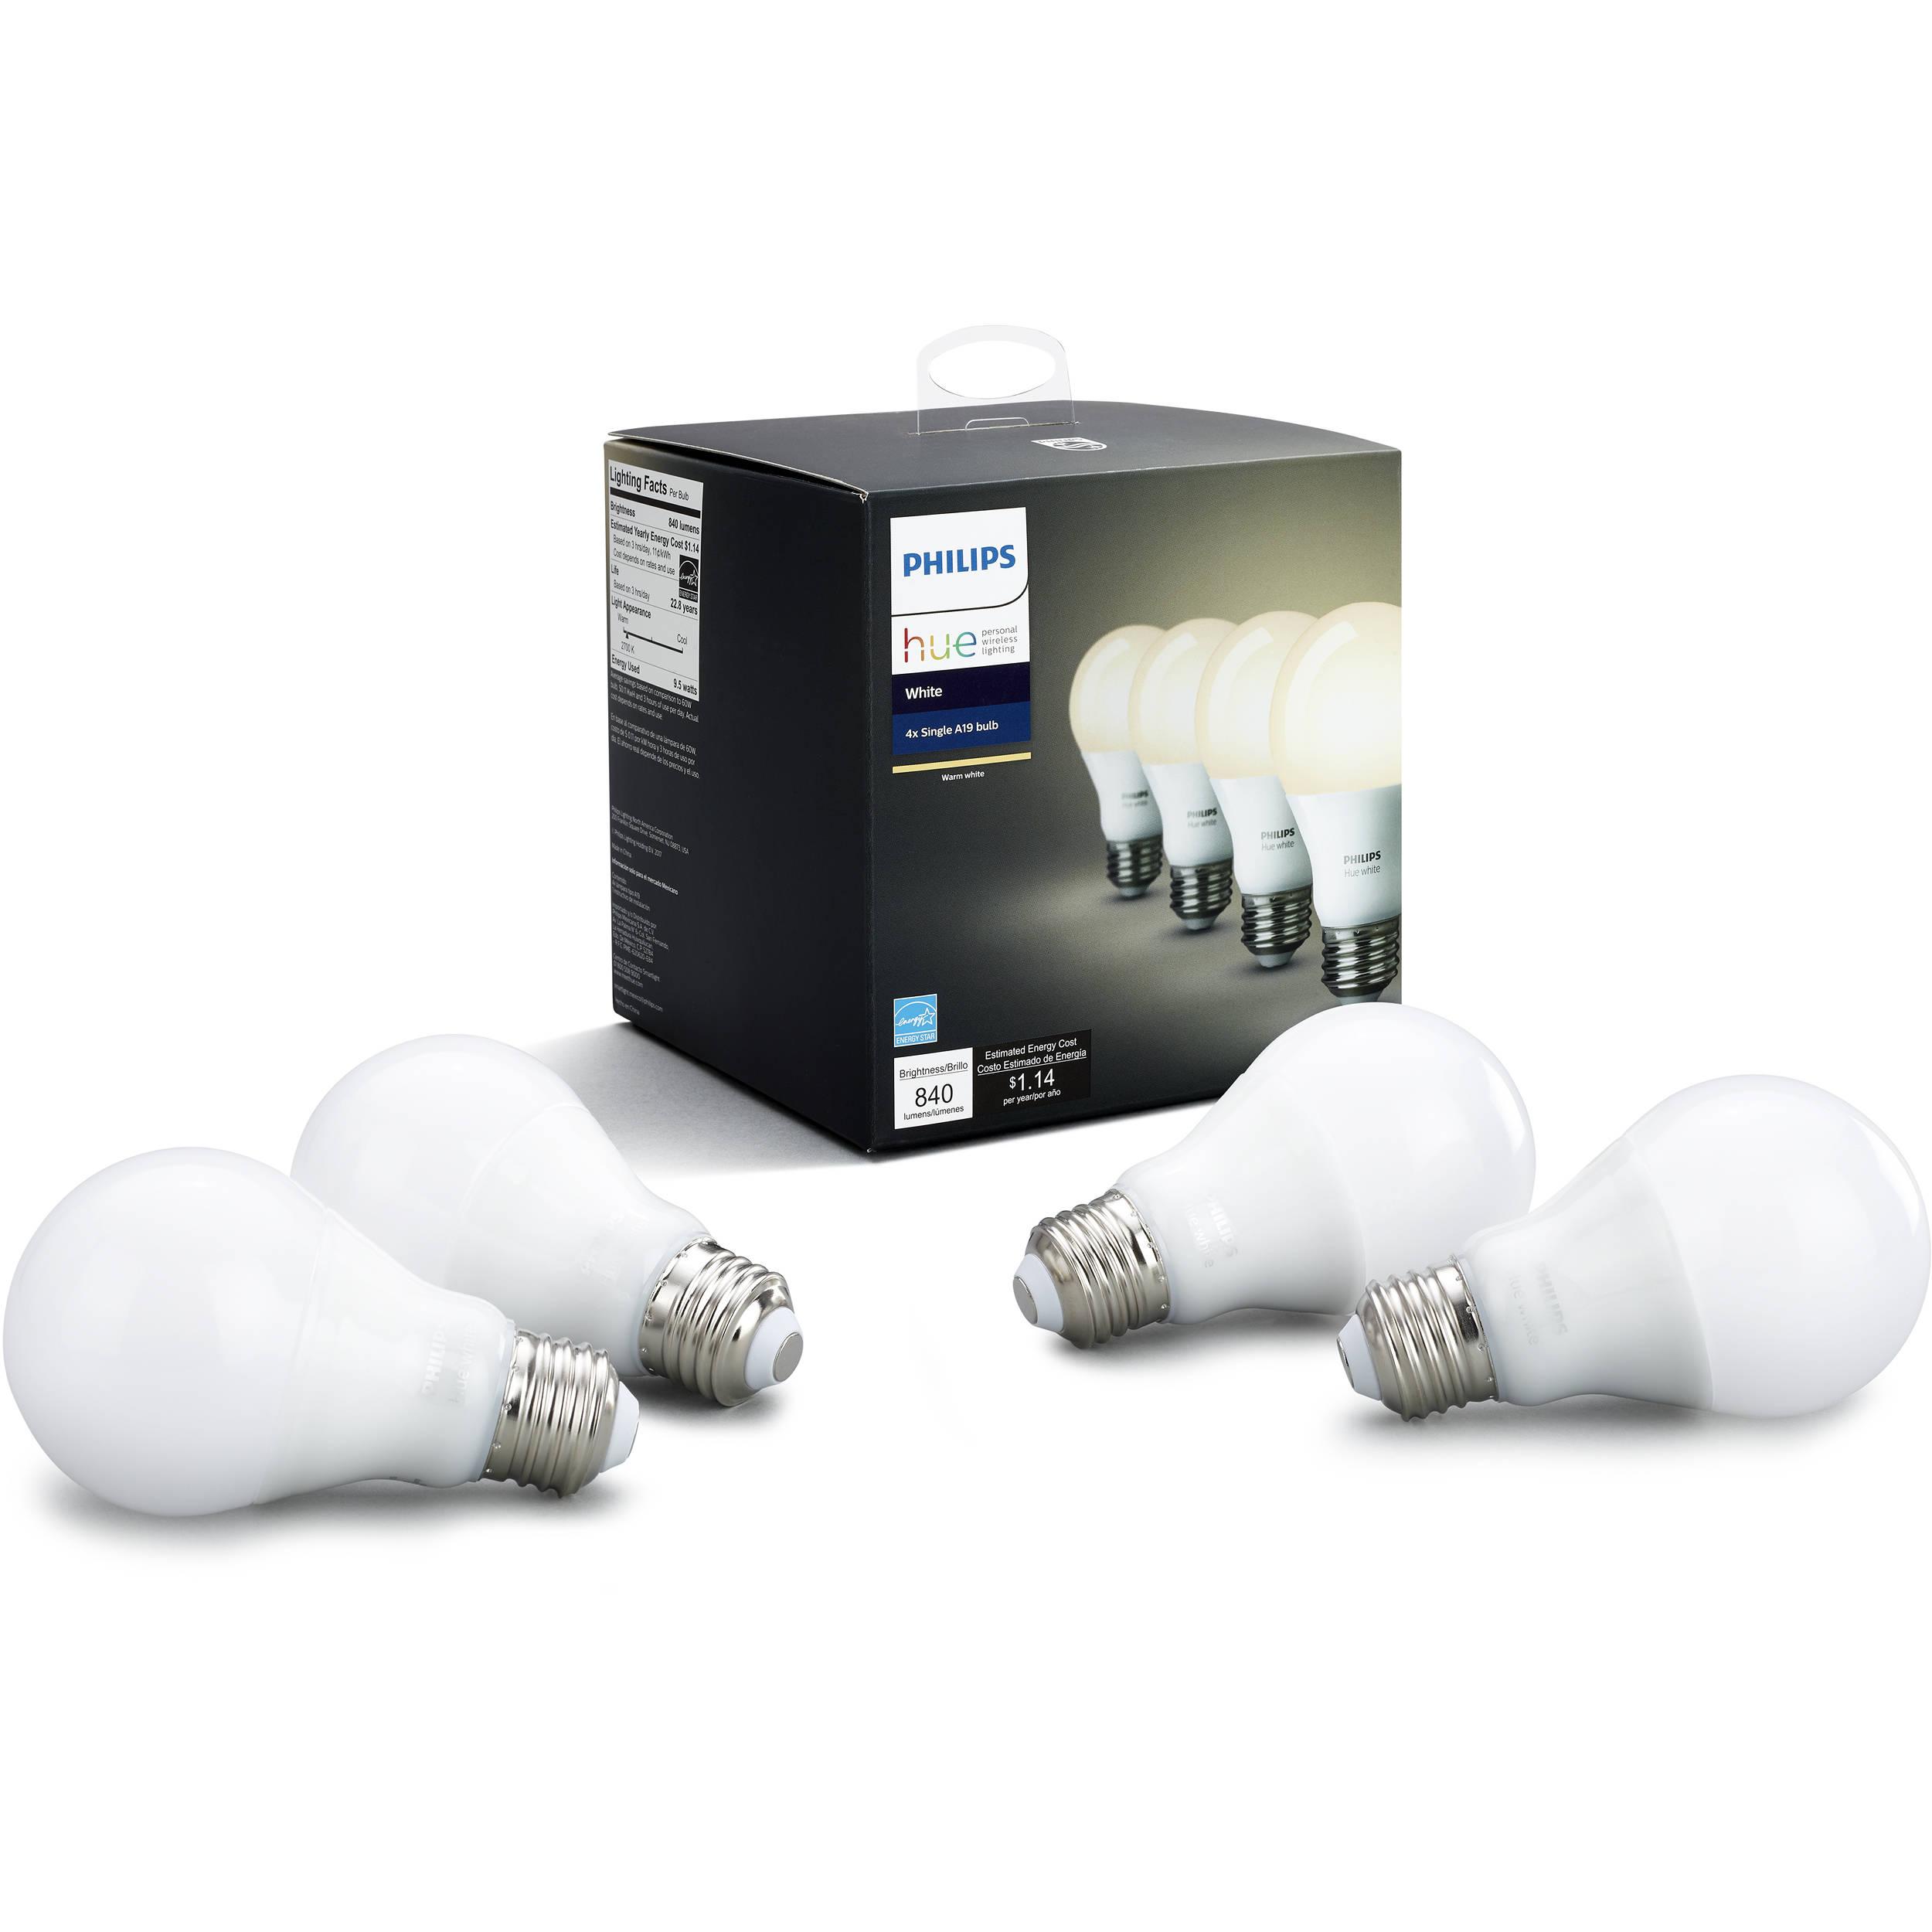 Philips Hue A19 Led Bulb Warm White 4 Pack 472027 Bh Photo Free Ongkir Dry Iron Hi 1172